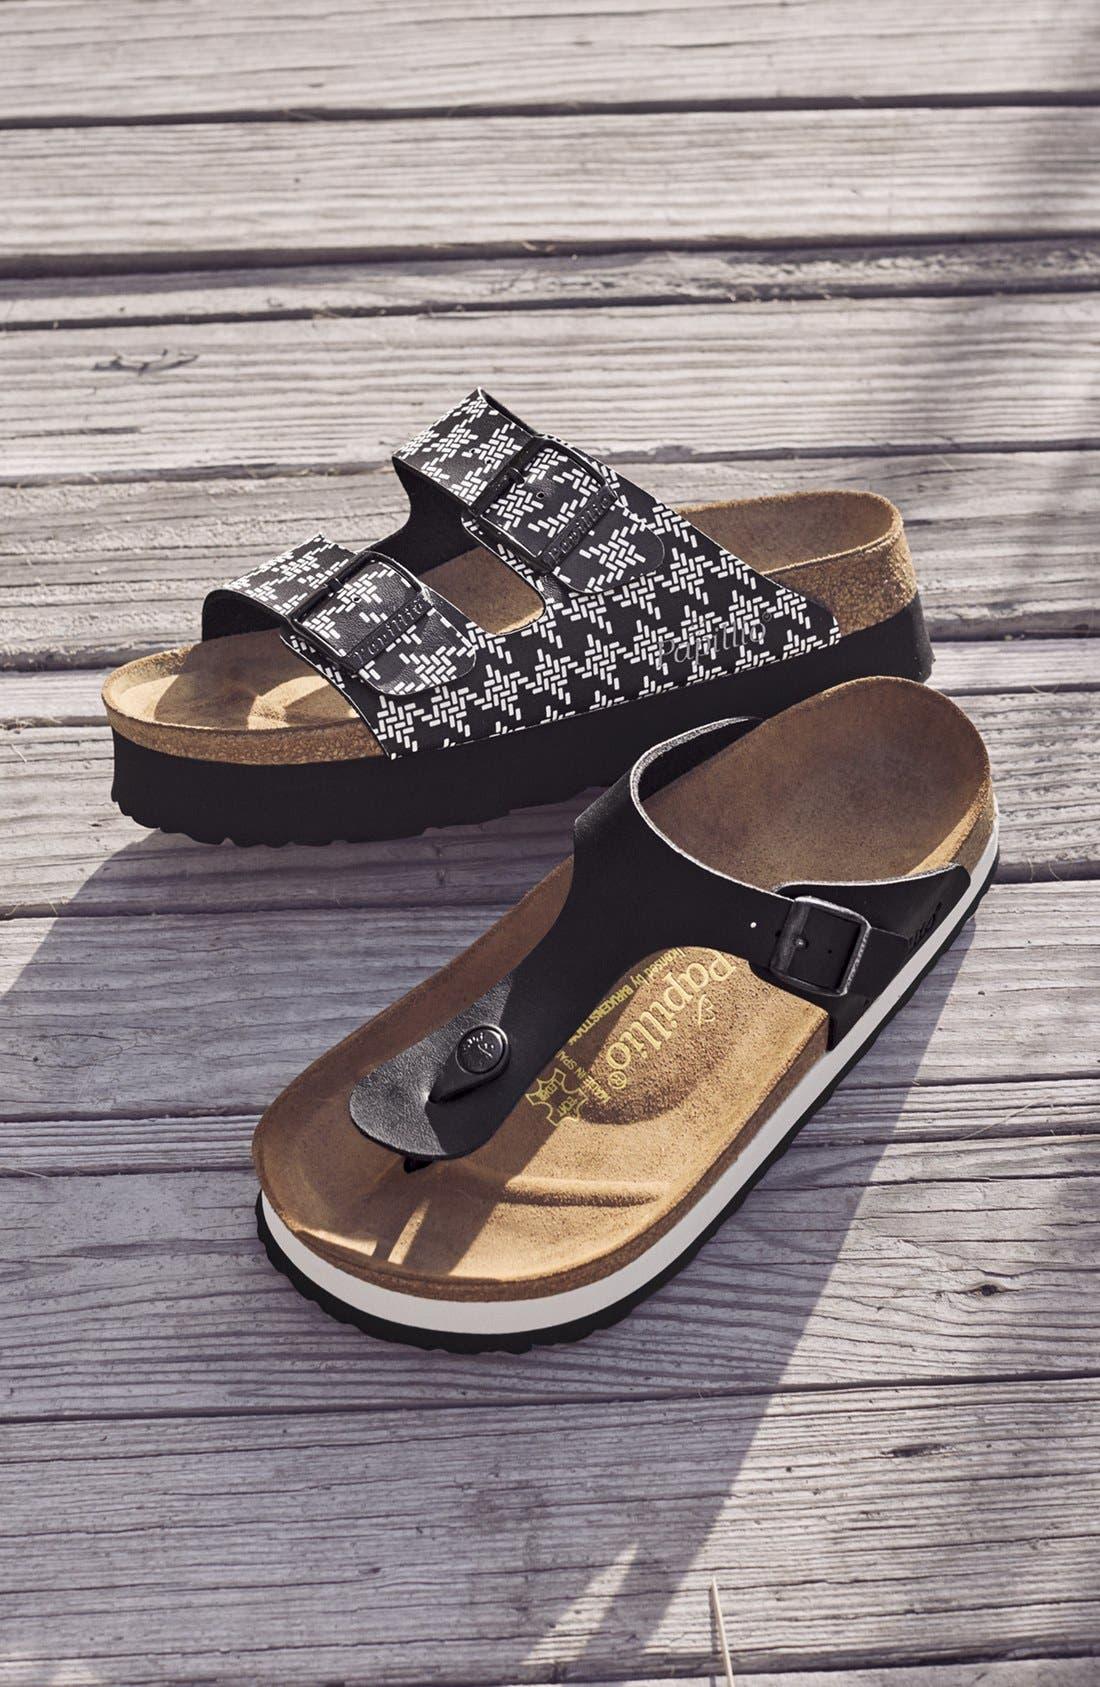 Papillio by Birkenstock 'Gizeh' Birko-Flor Platform Flip Flop Sandal,                             Alternate thumbnail 5, color,